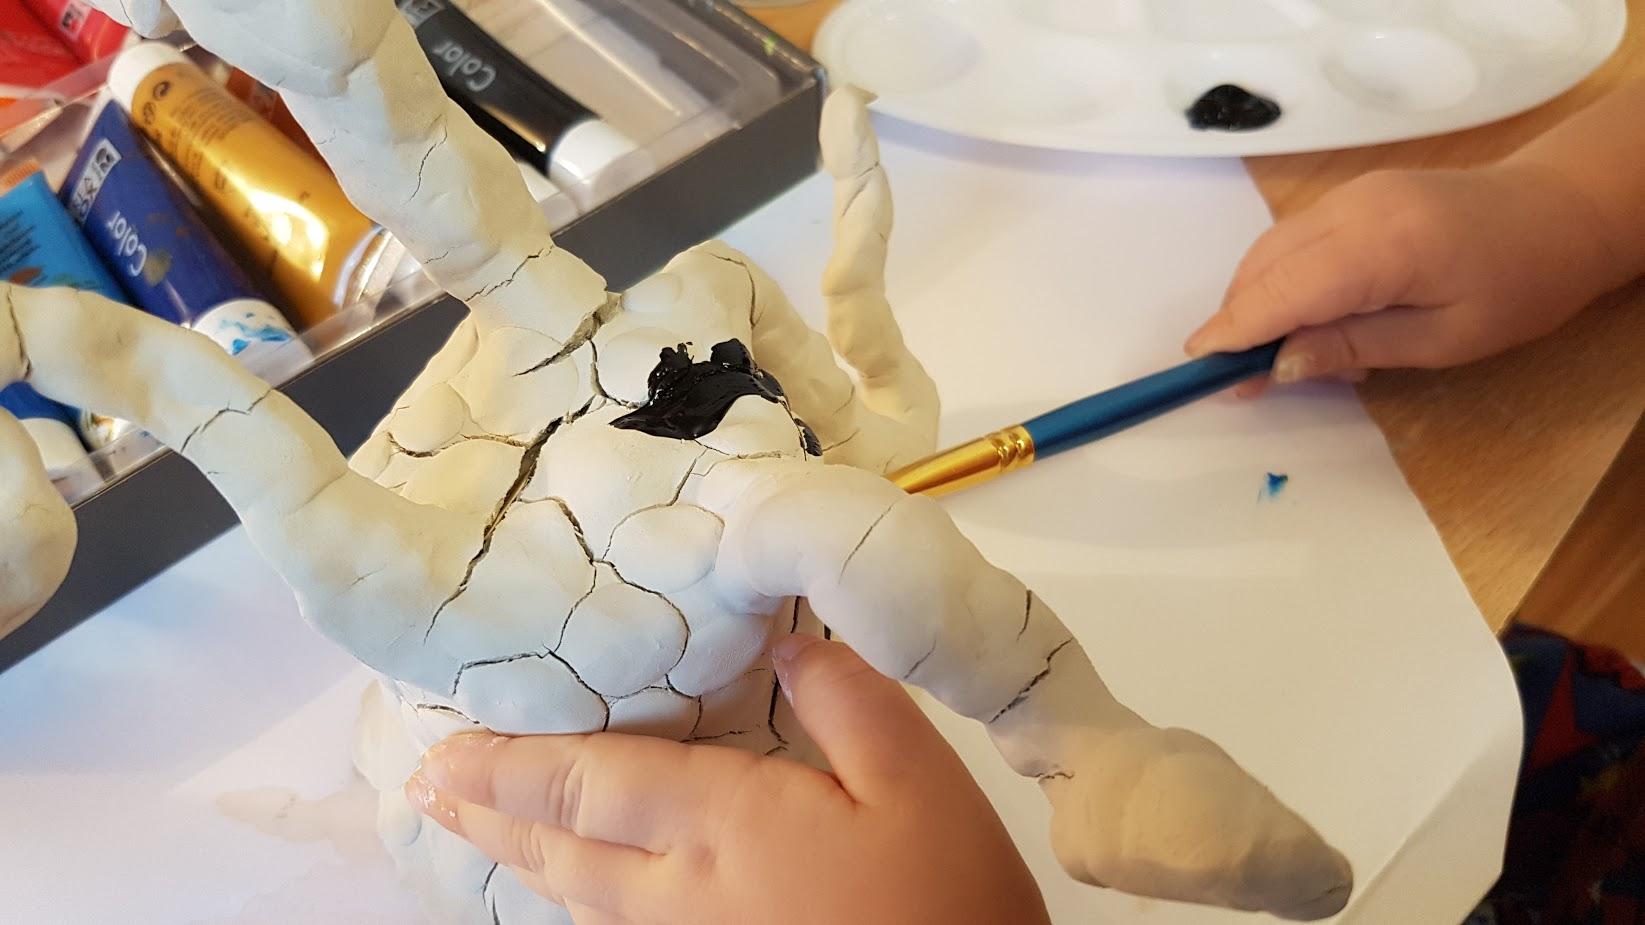 Kind bemalt Ton mit Acrylfarbe